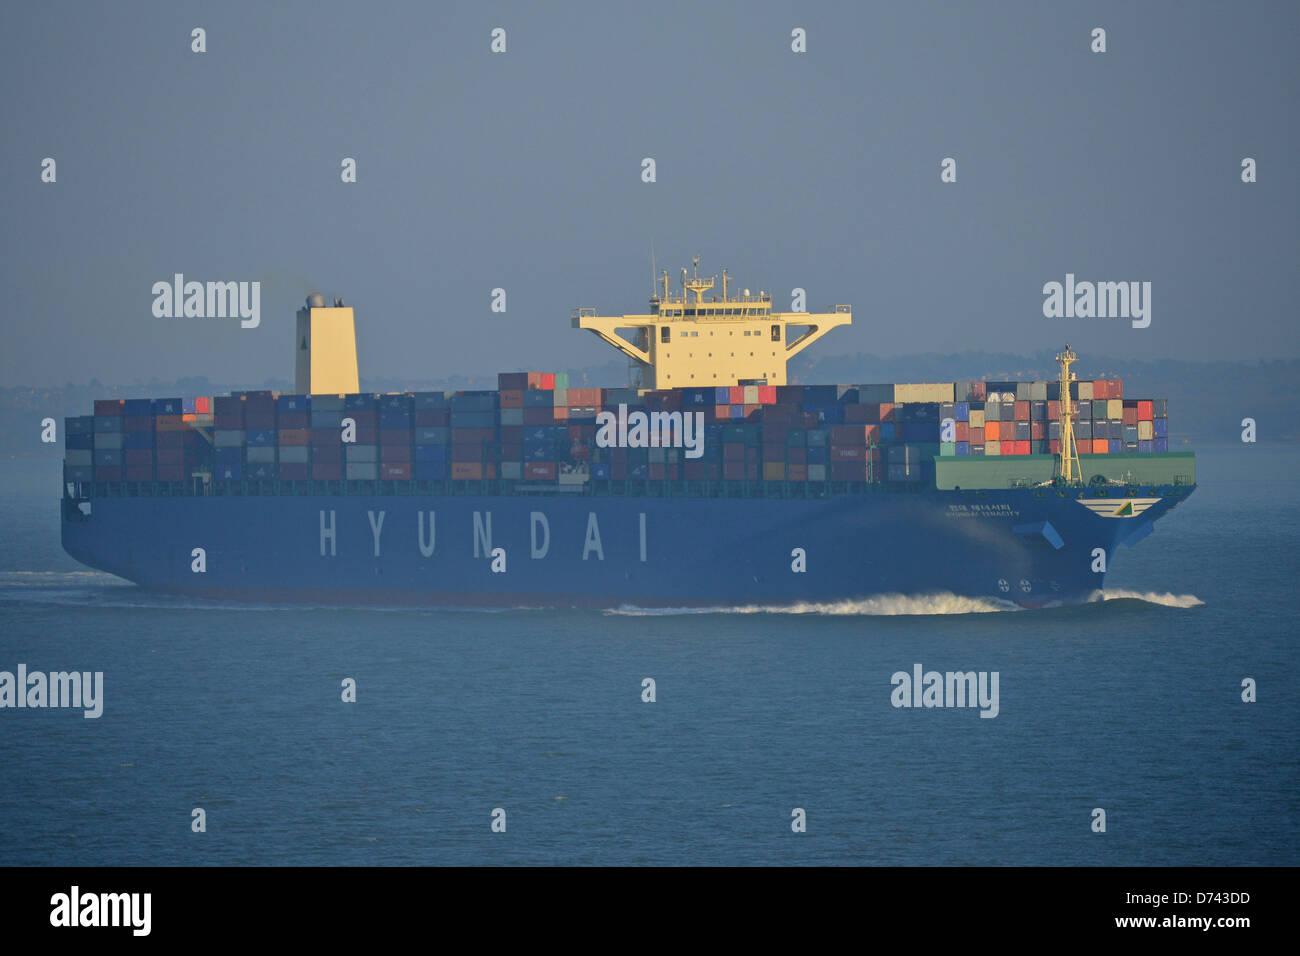 Hyundai Tenacity container ship entering Port of Southampton, Southampton, Hampshire, England, United Kingdom - Stock Image